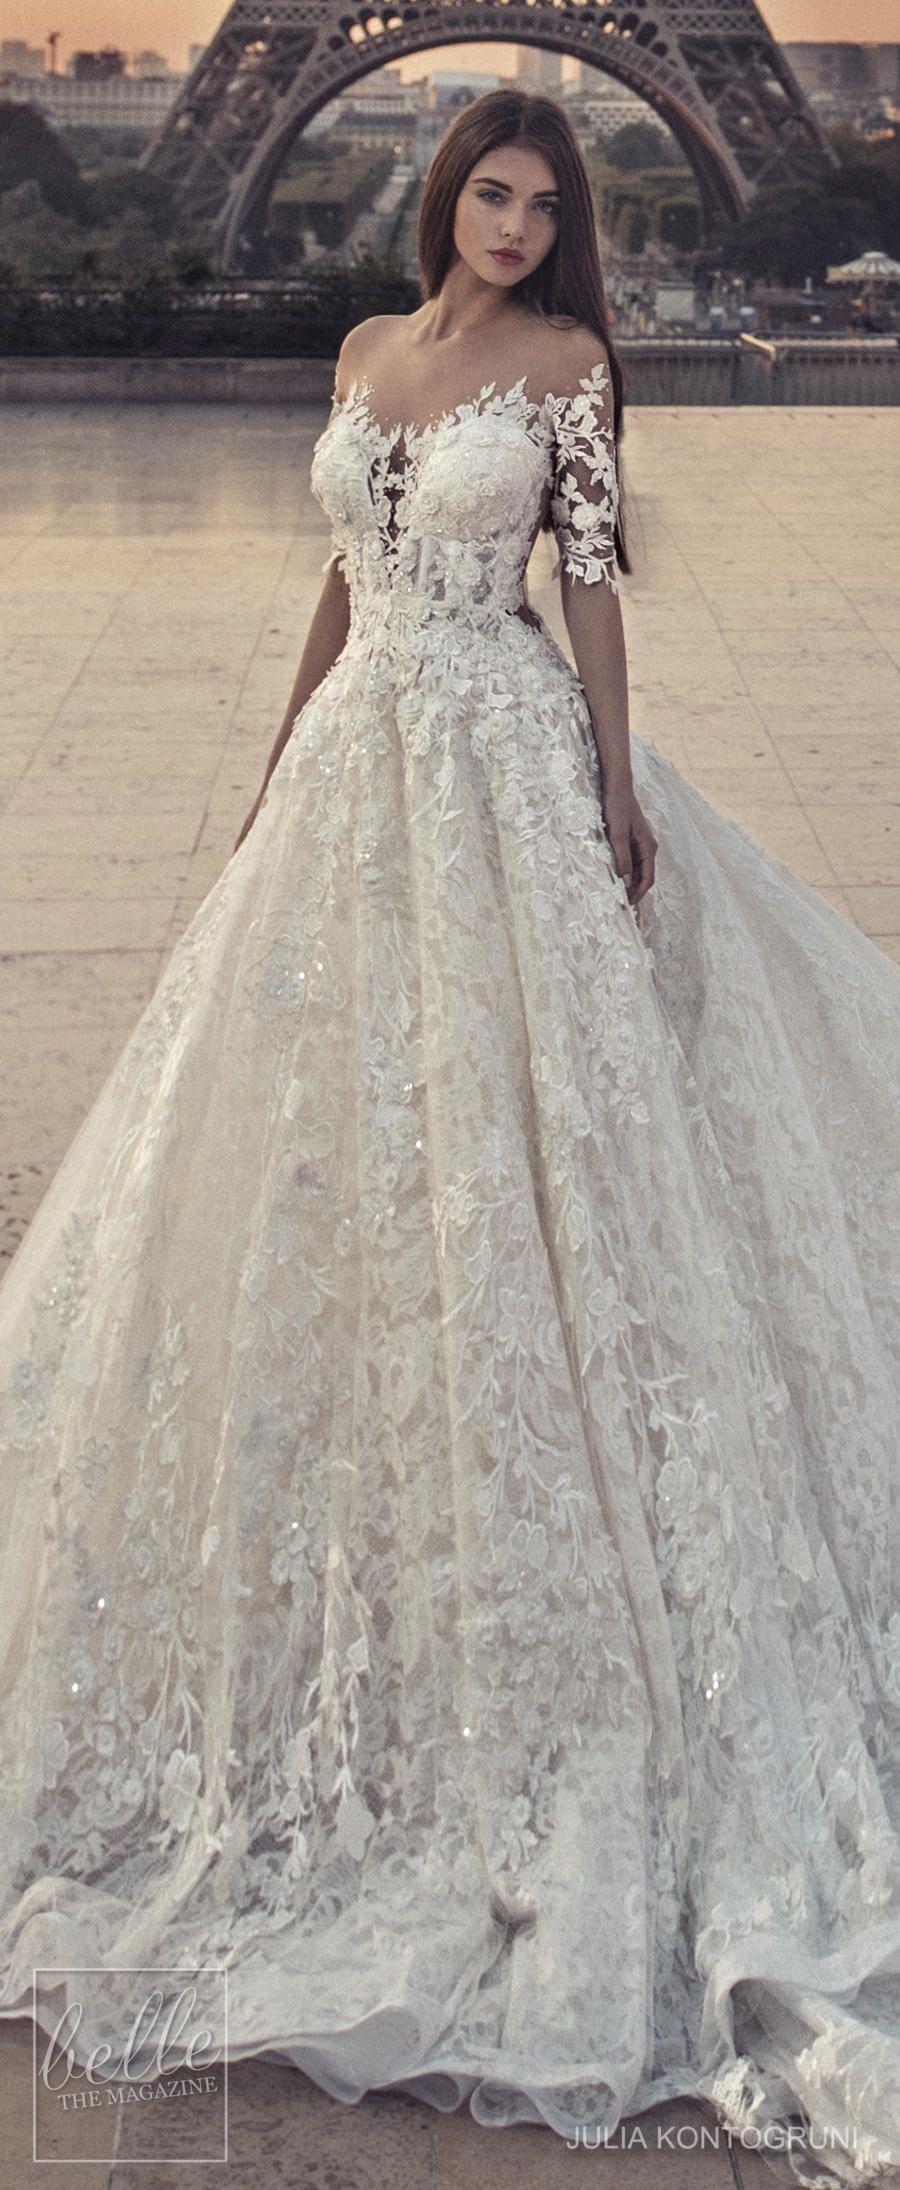 Julia kontogruni wedding dress collection widding dress